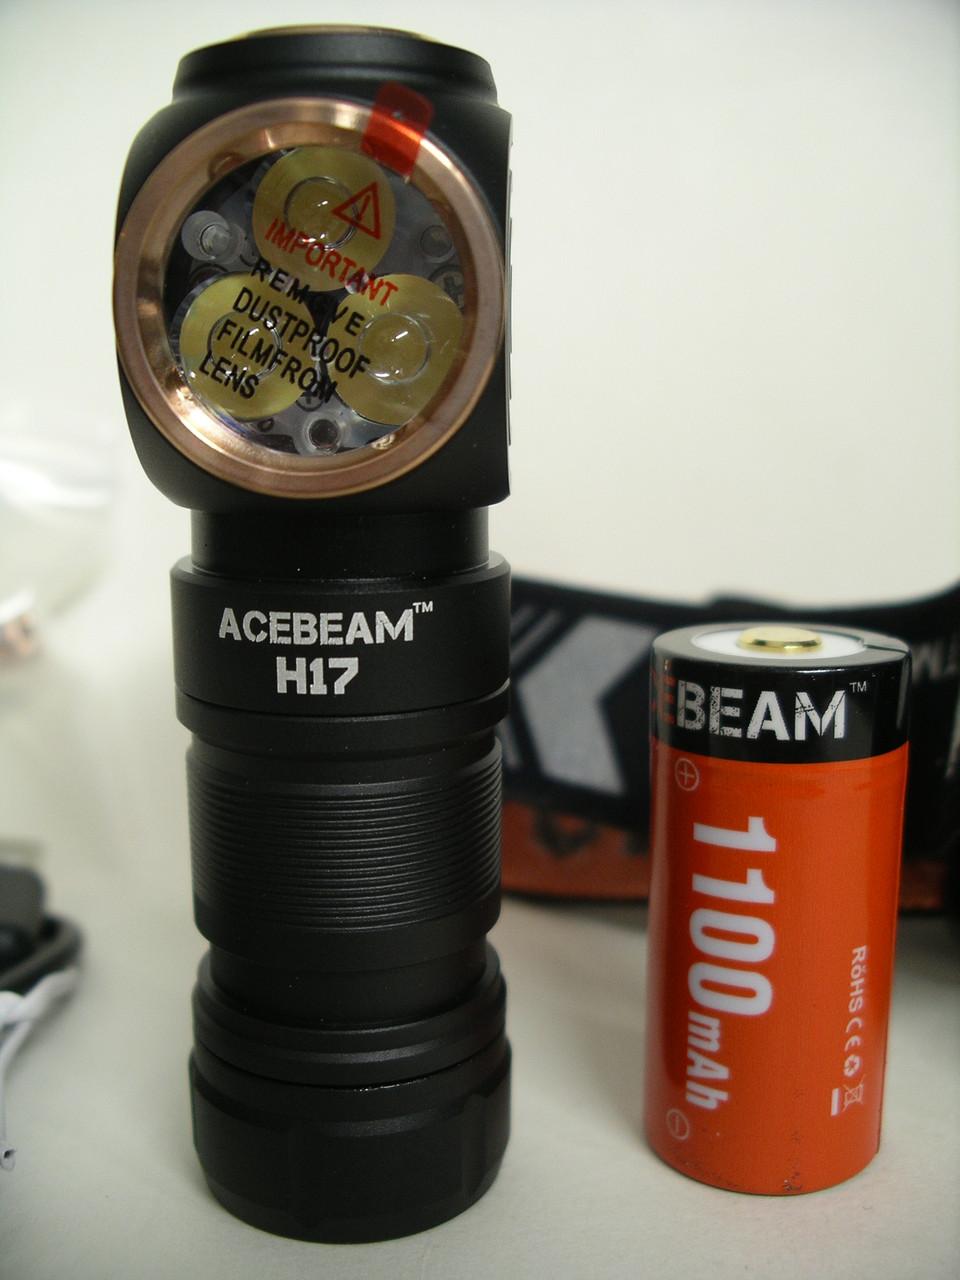 Ліхтар Acebeam H17 3 x NICHIA 219C LEDs CRI≥90 5000K